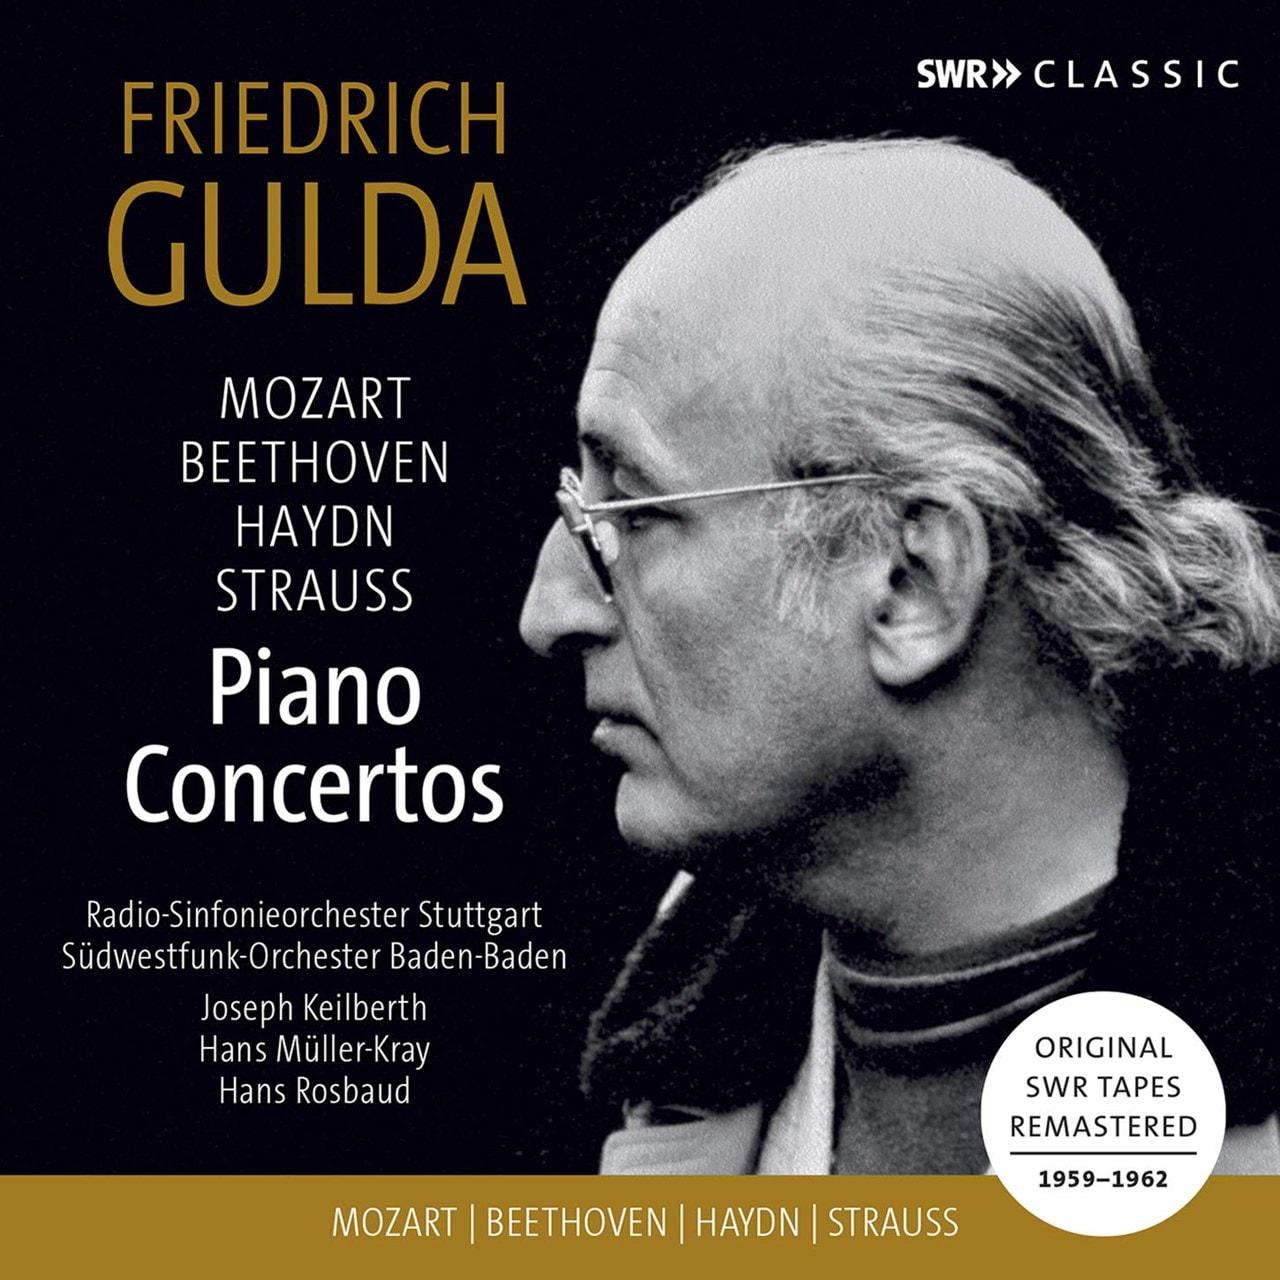 Friedrich Gulda: Piano Concertos - 1